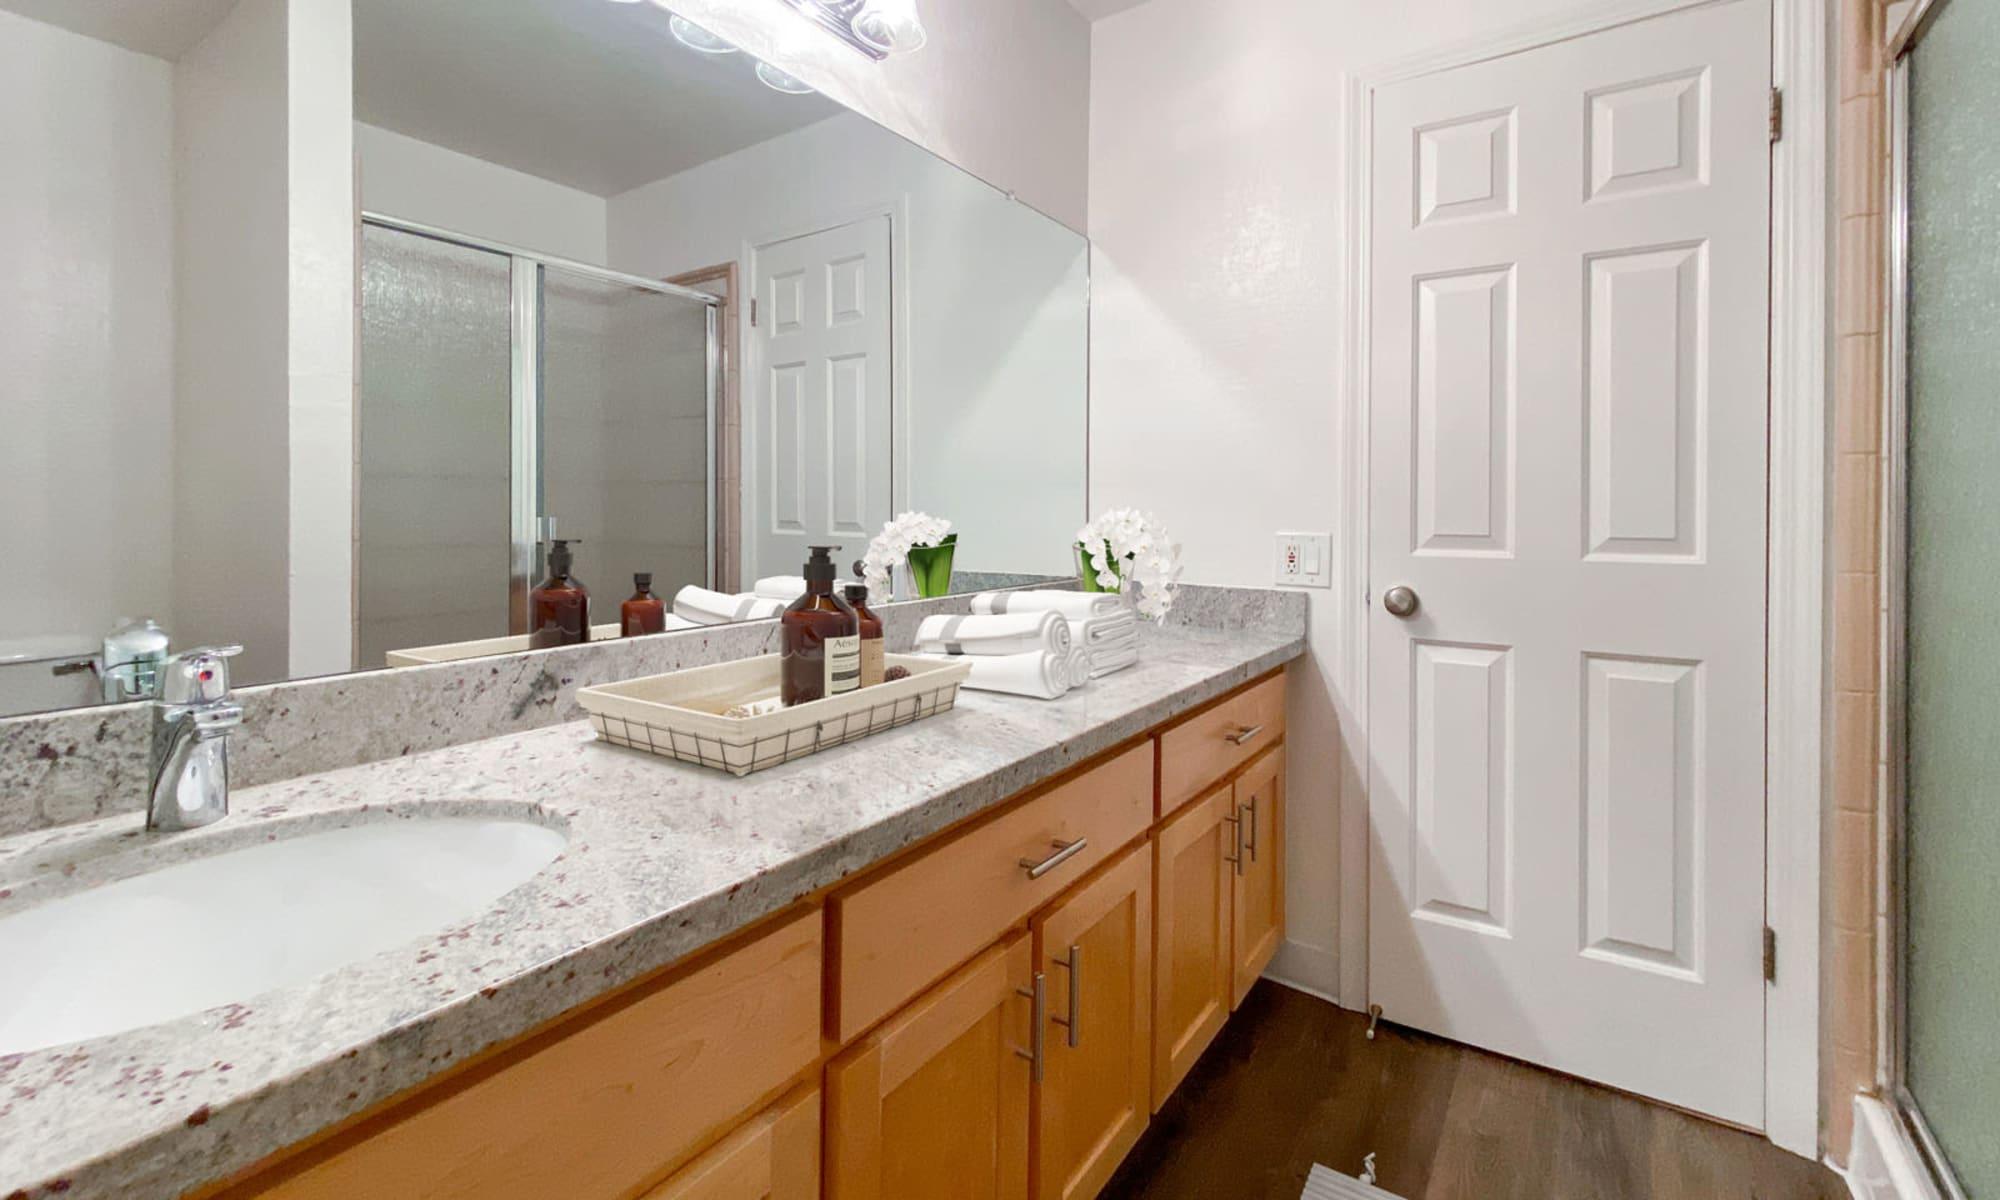 Large vanity mirror and a granite countertop in a model apartment's primary bathroom at Pleasanton Glen Apartment Homes in Pleasanton, California